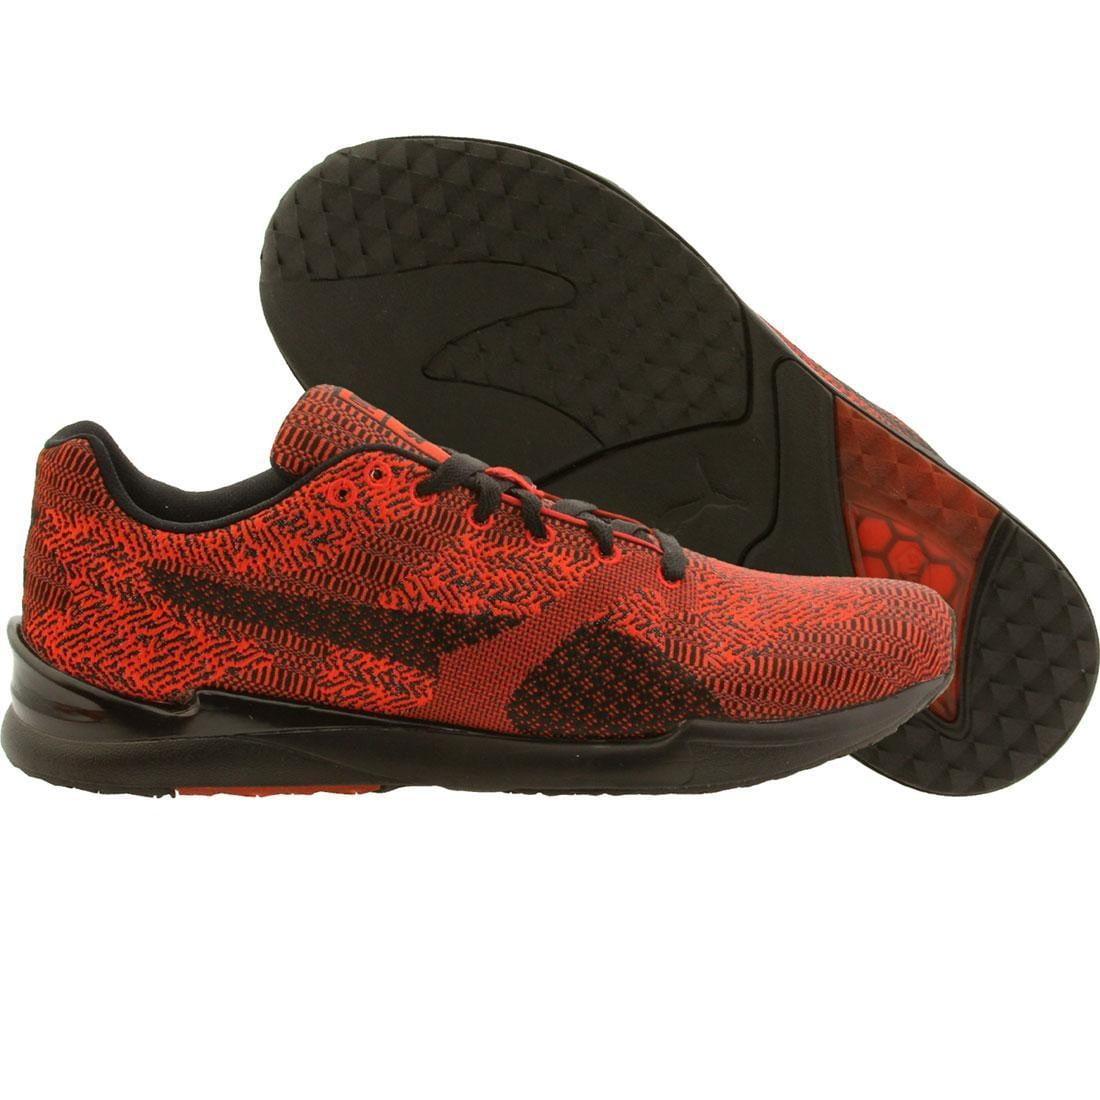 Men's Xs500 Woven High Risk Red/Black36010605